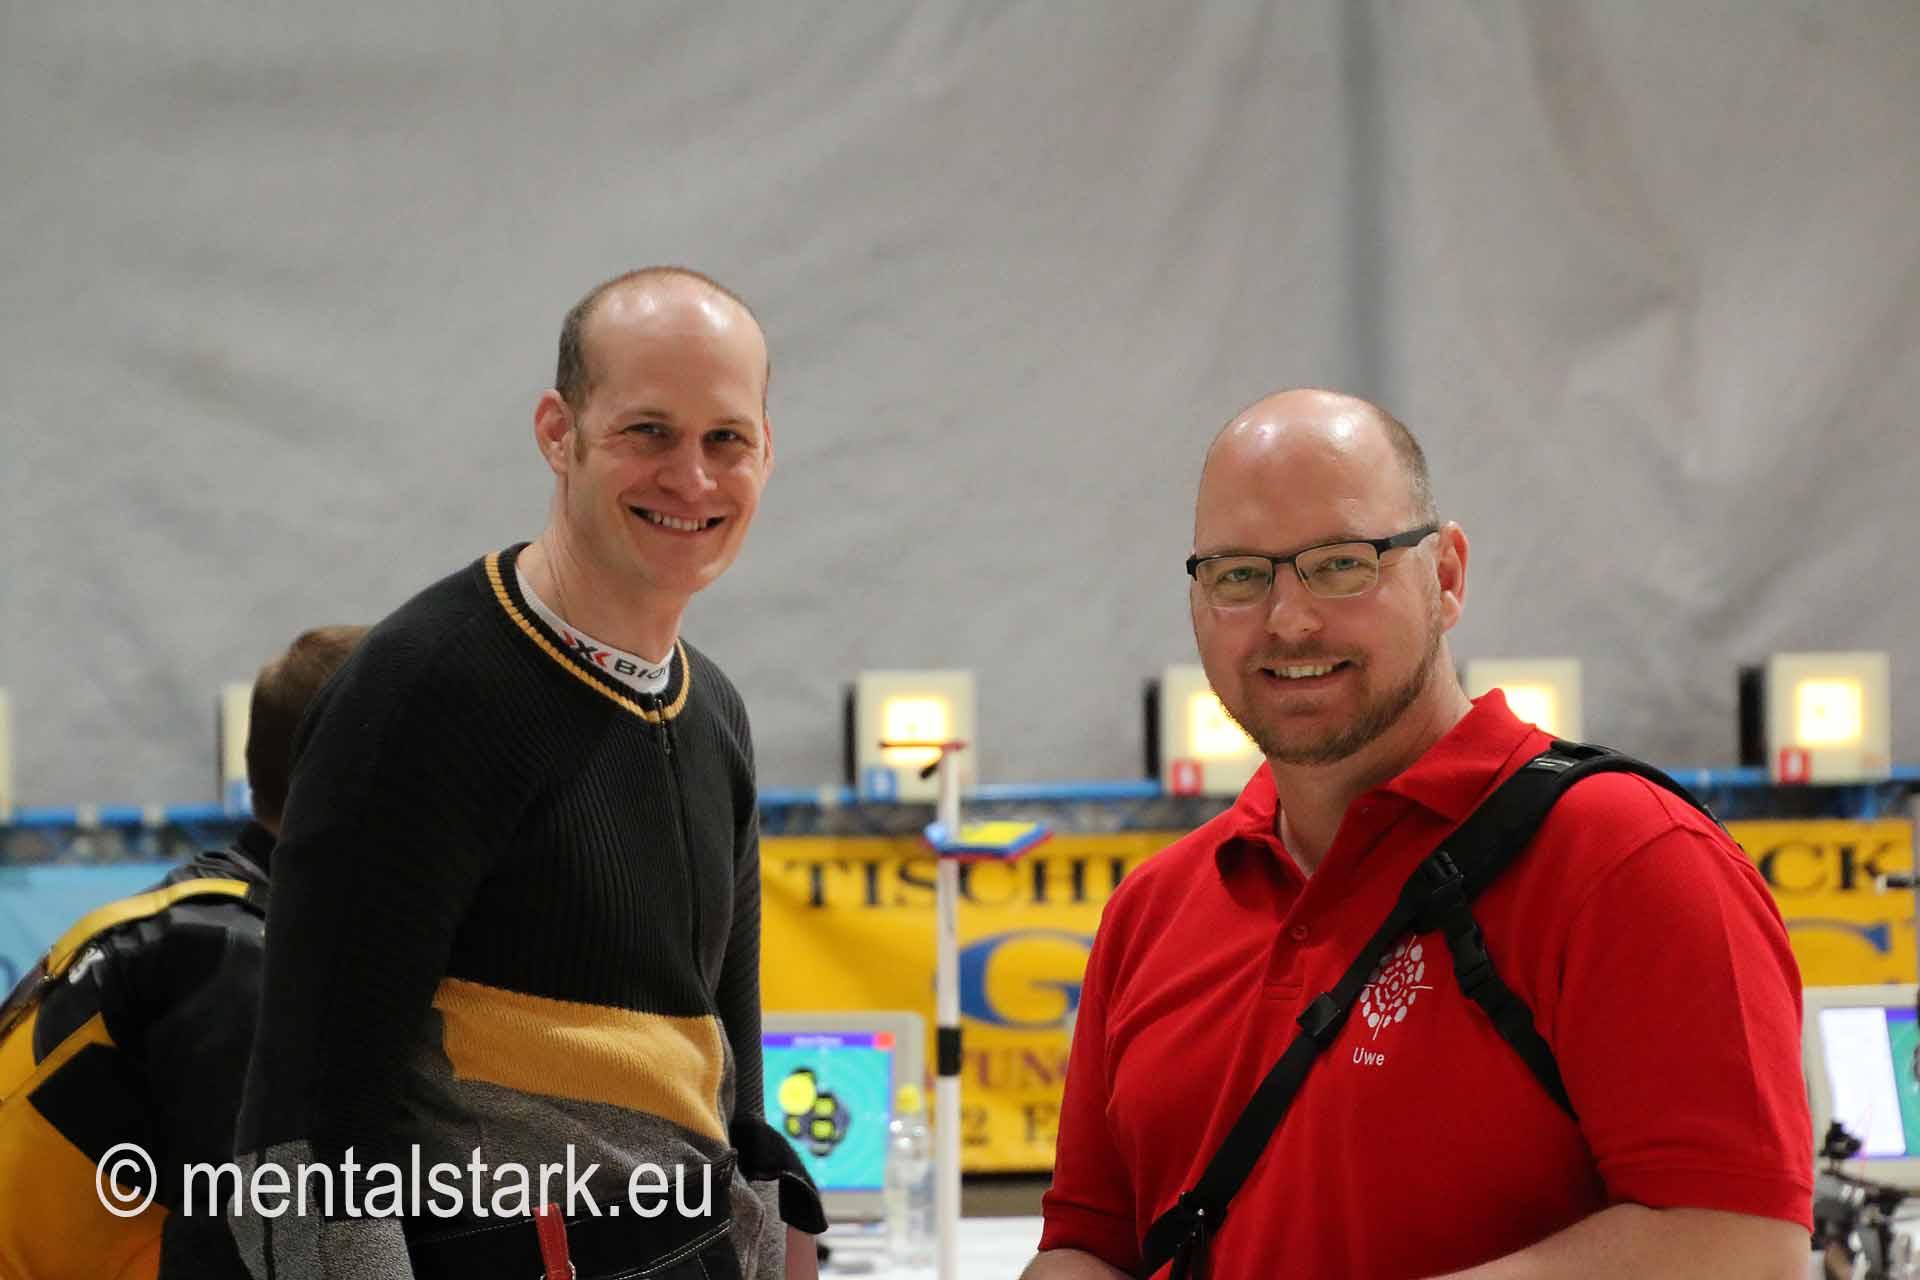 Thomas Muxel und Uwe Gessl (Förderbonusgewinner 2016/17)